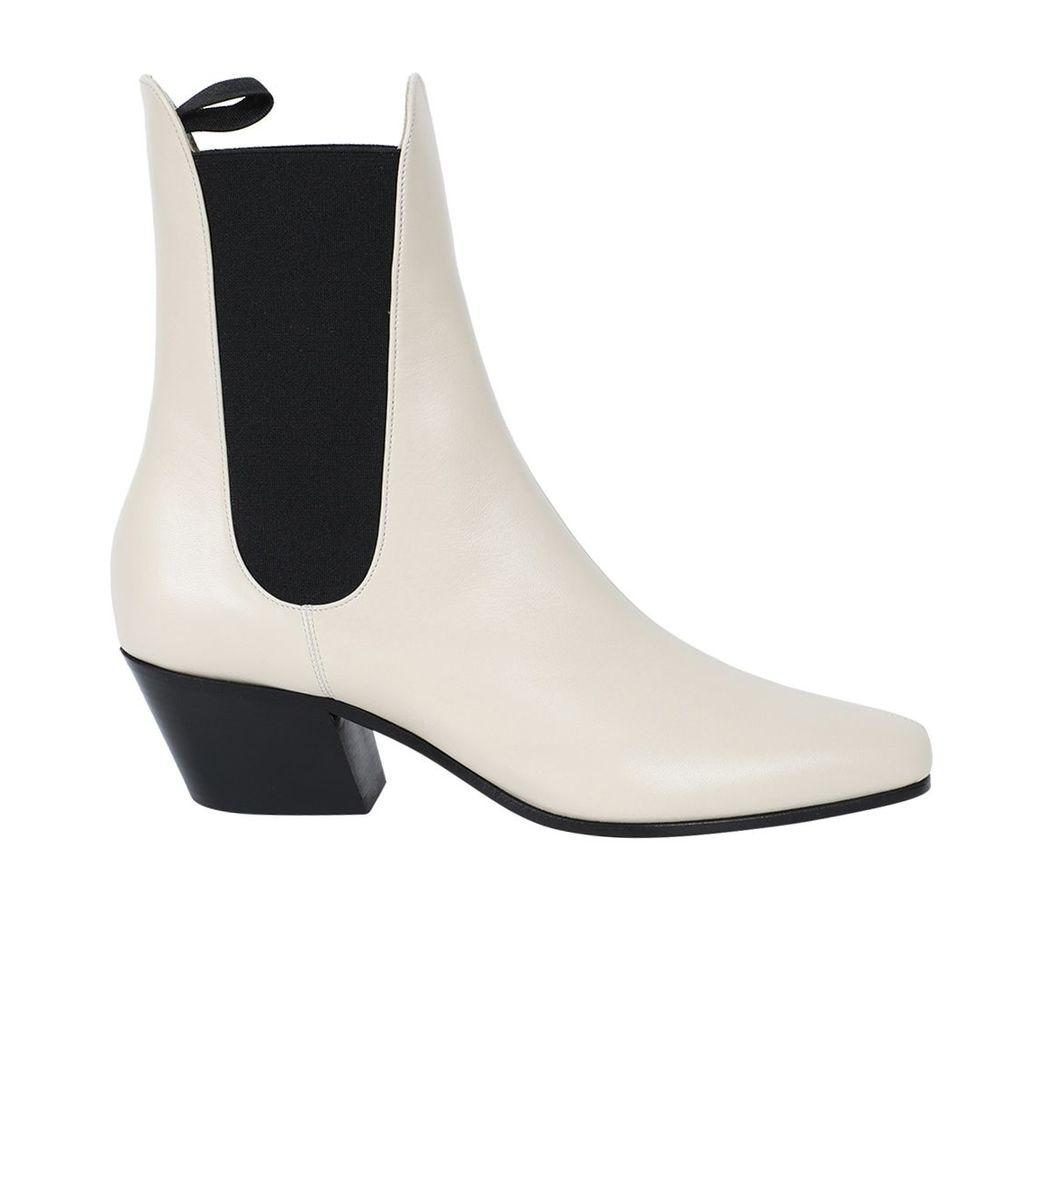 Khaite Saratoga Chelsea Boots